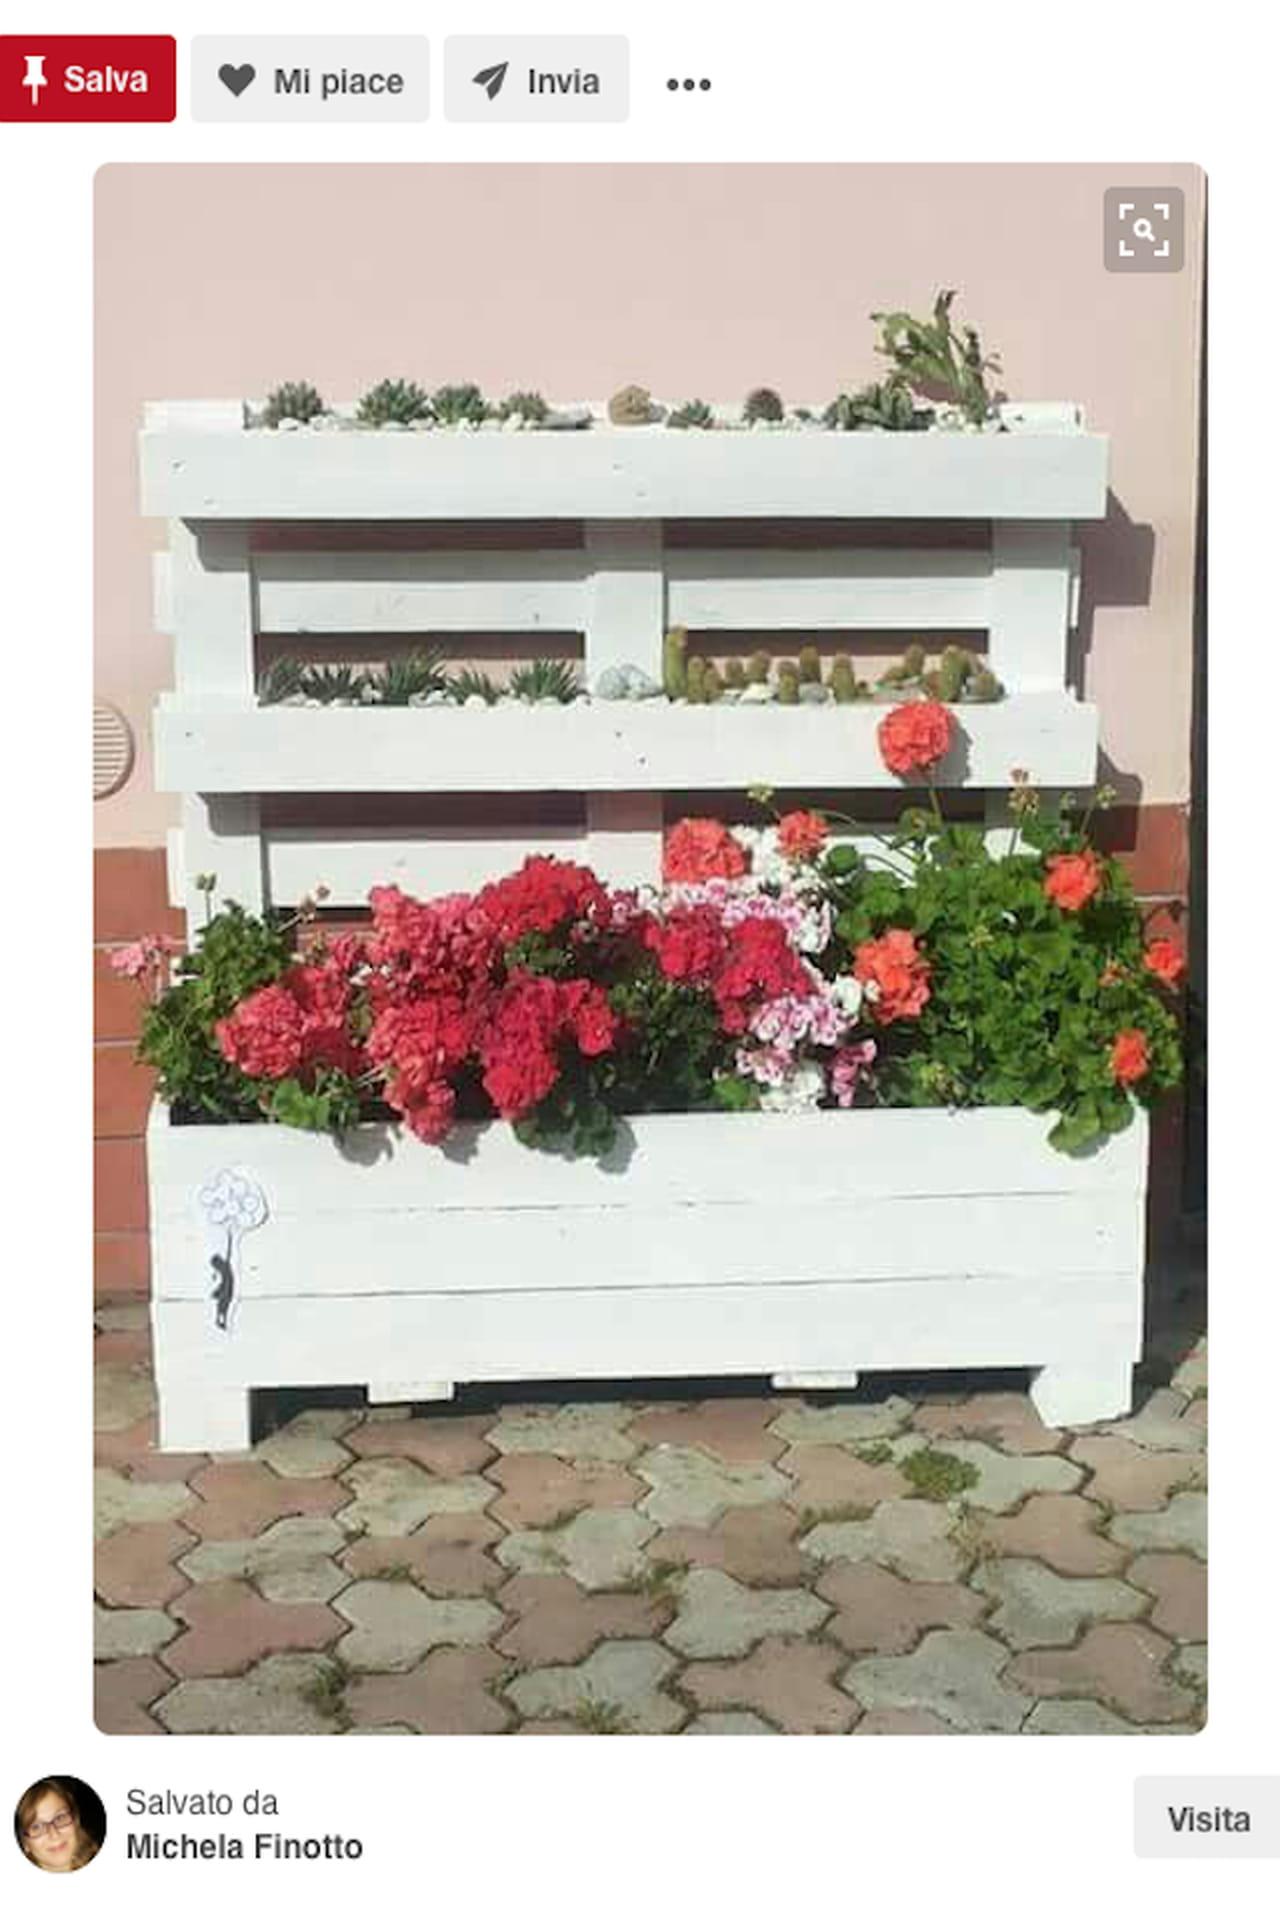 Creazioni fai da te idee giardino da pinterest - Pavimento da giardino fai da te ...